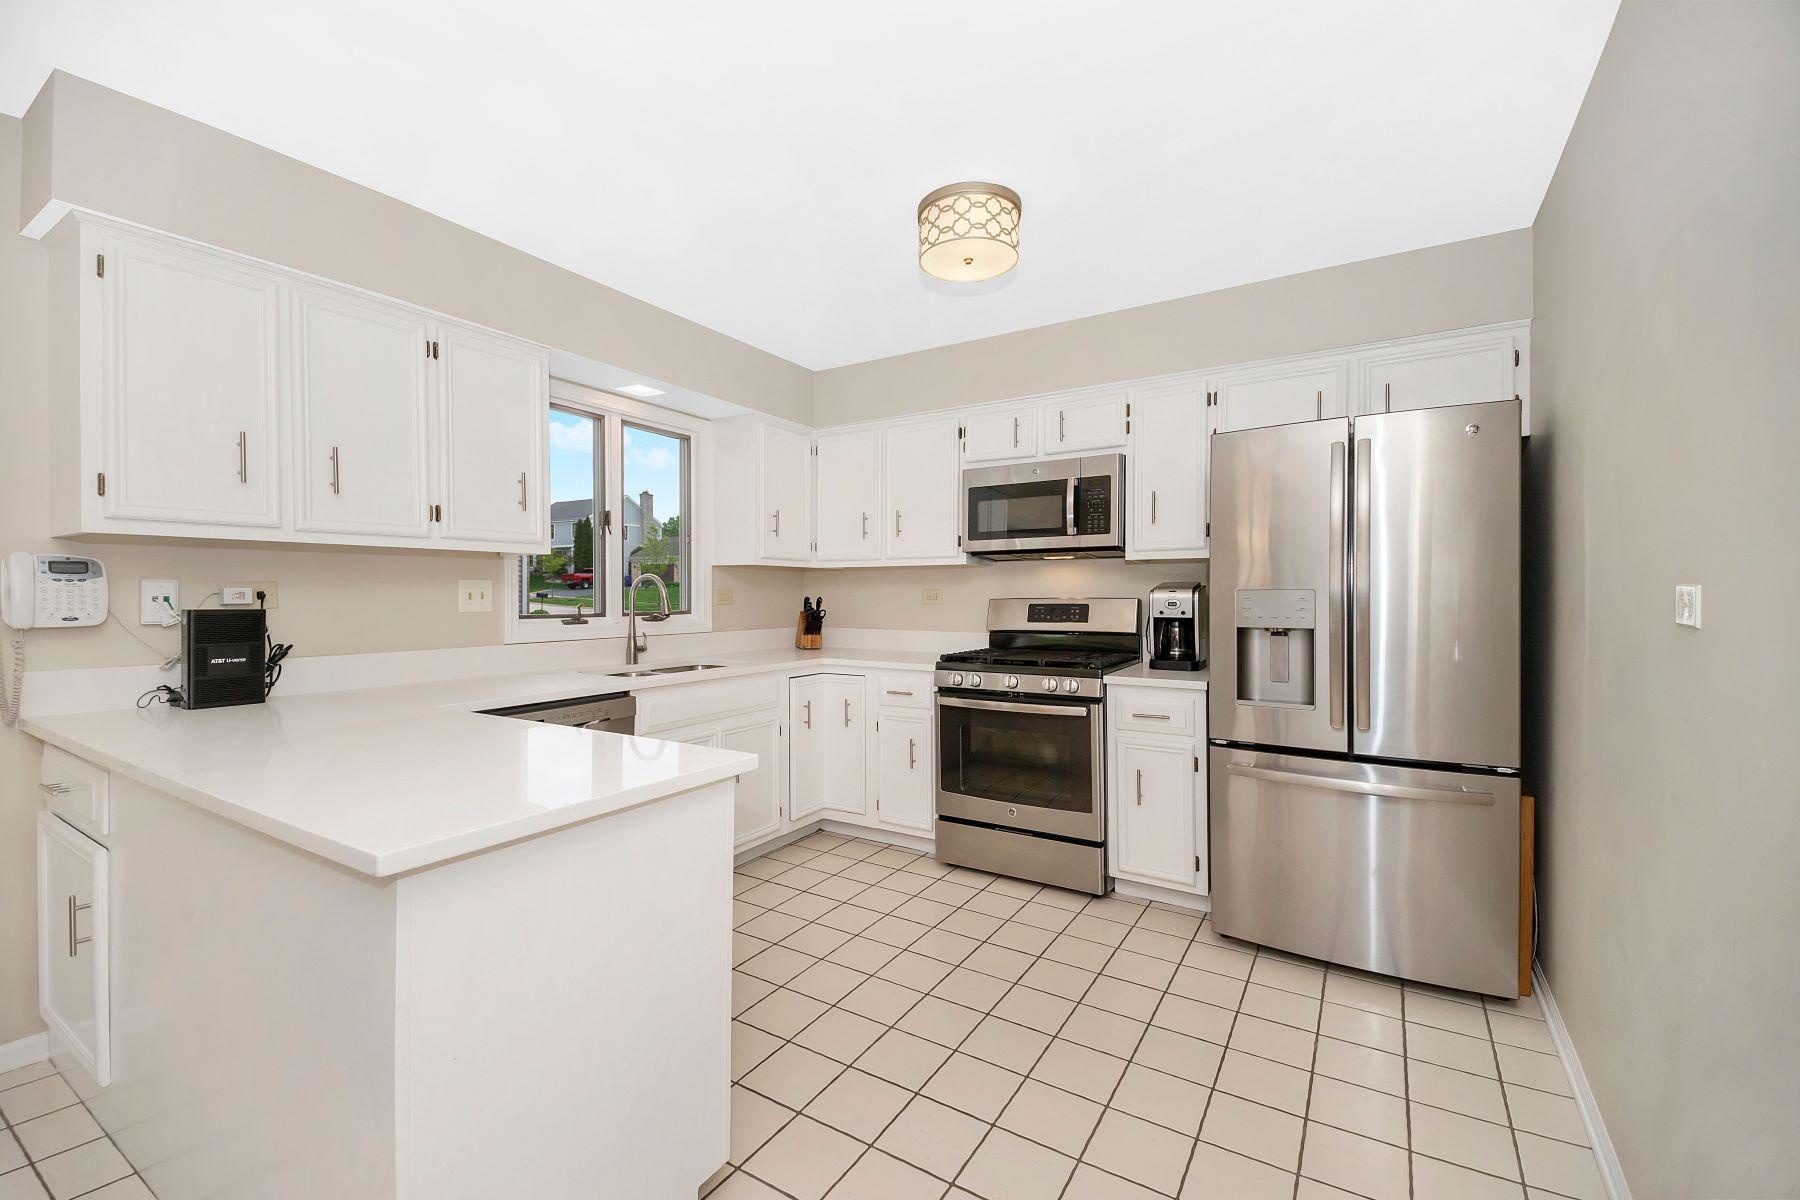 Additional photo for property listing at A Wonderful Community 129 Sunset Ridge Road, Willowbrook, Ιλινοϊσ 60527 Ηνωμένες Πολιτείες